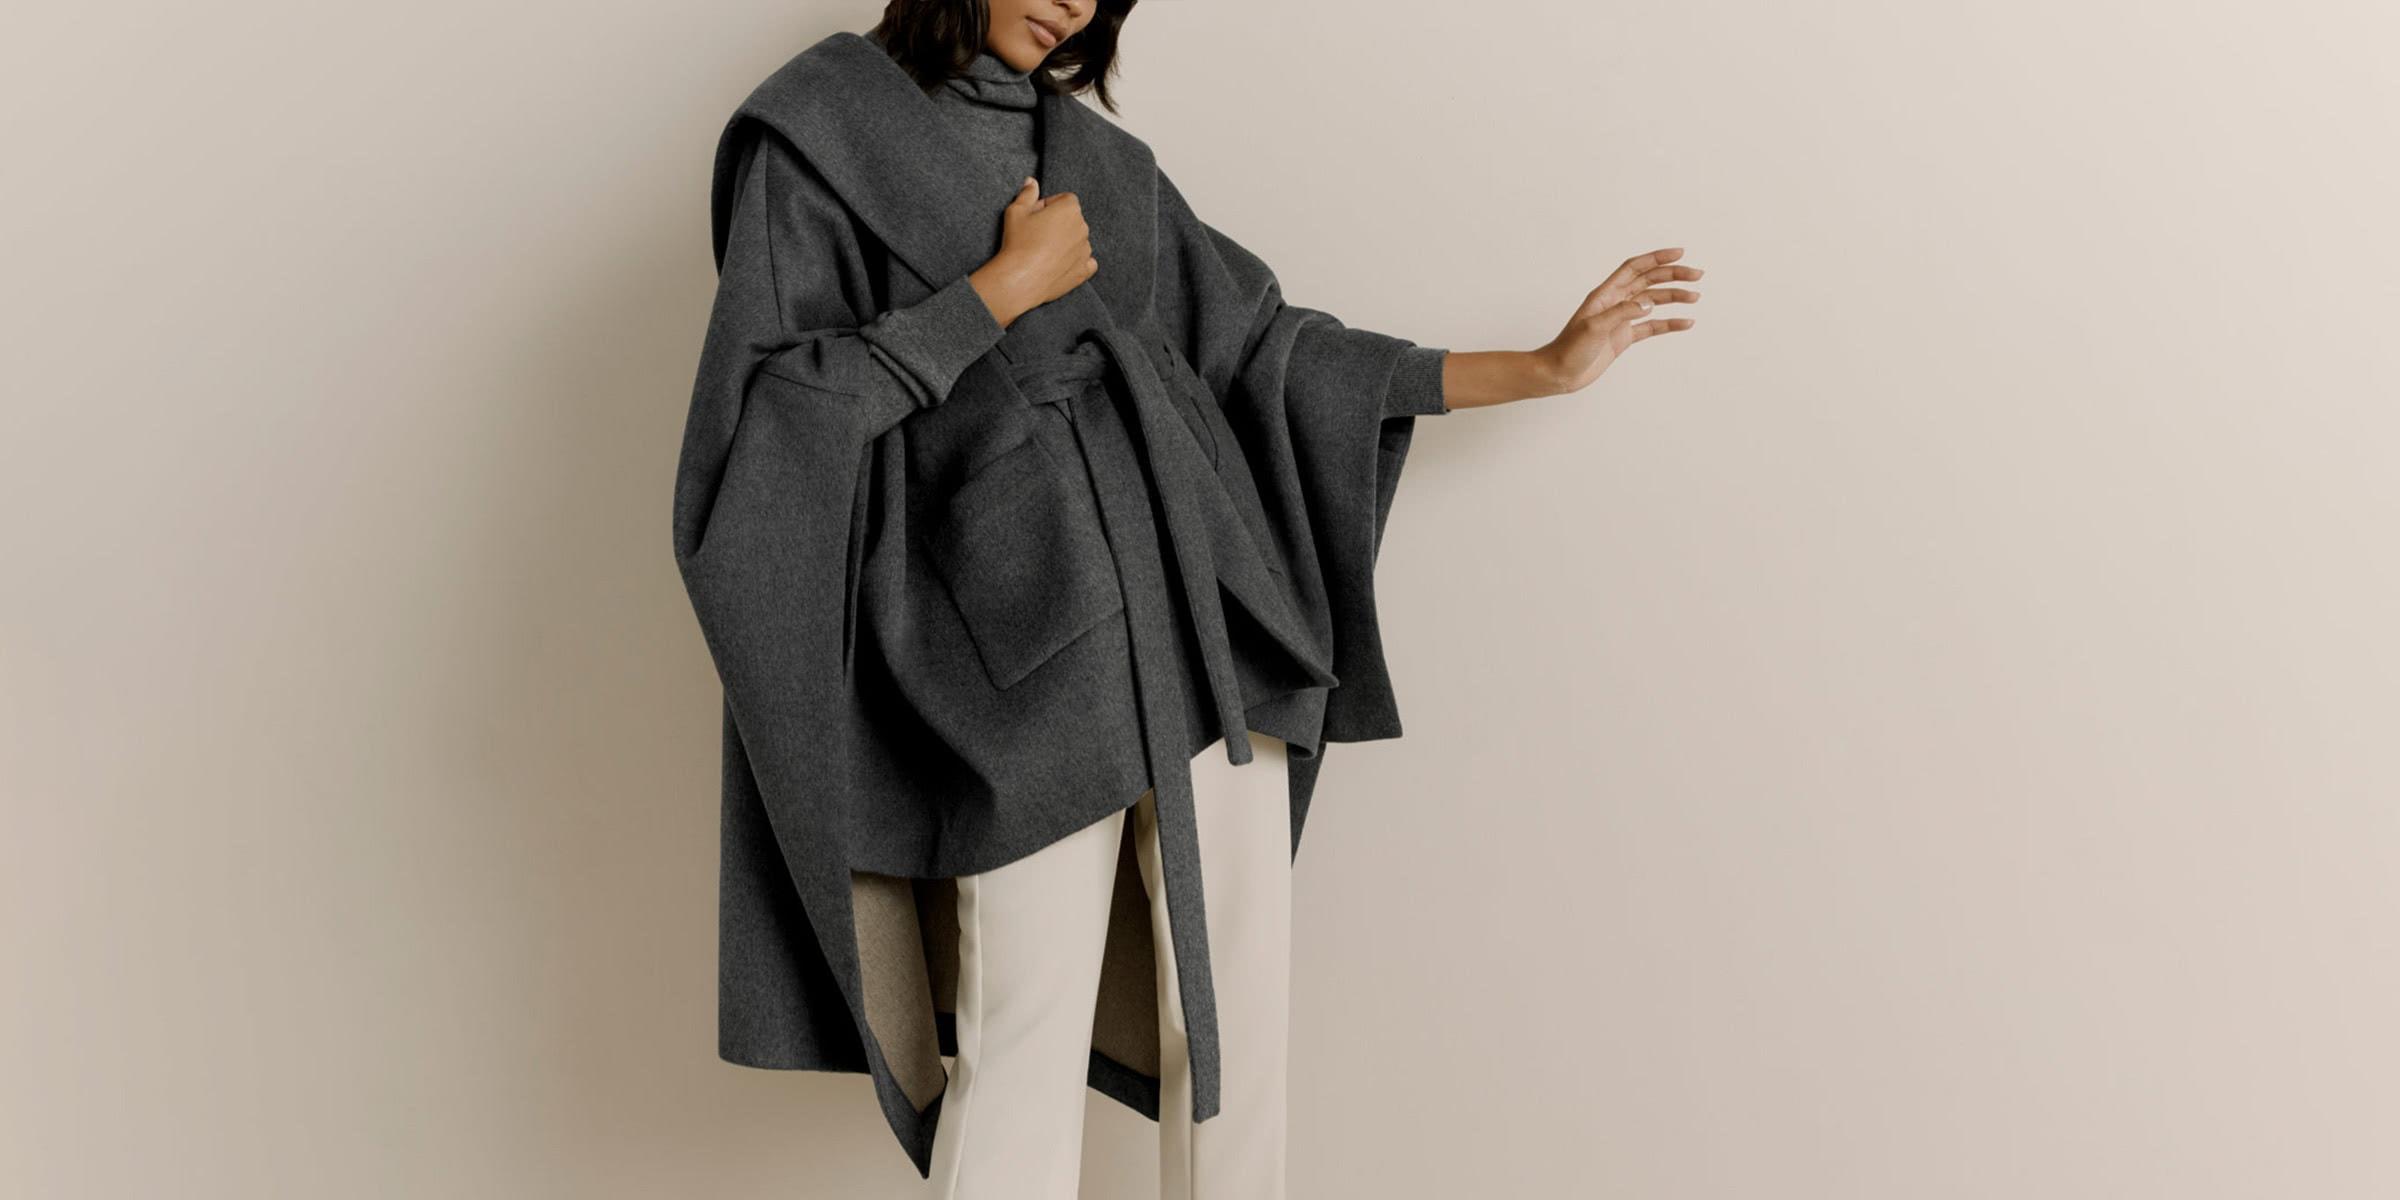 best winter coats women - Luxe Digital